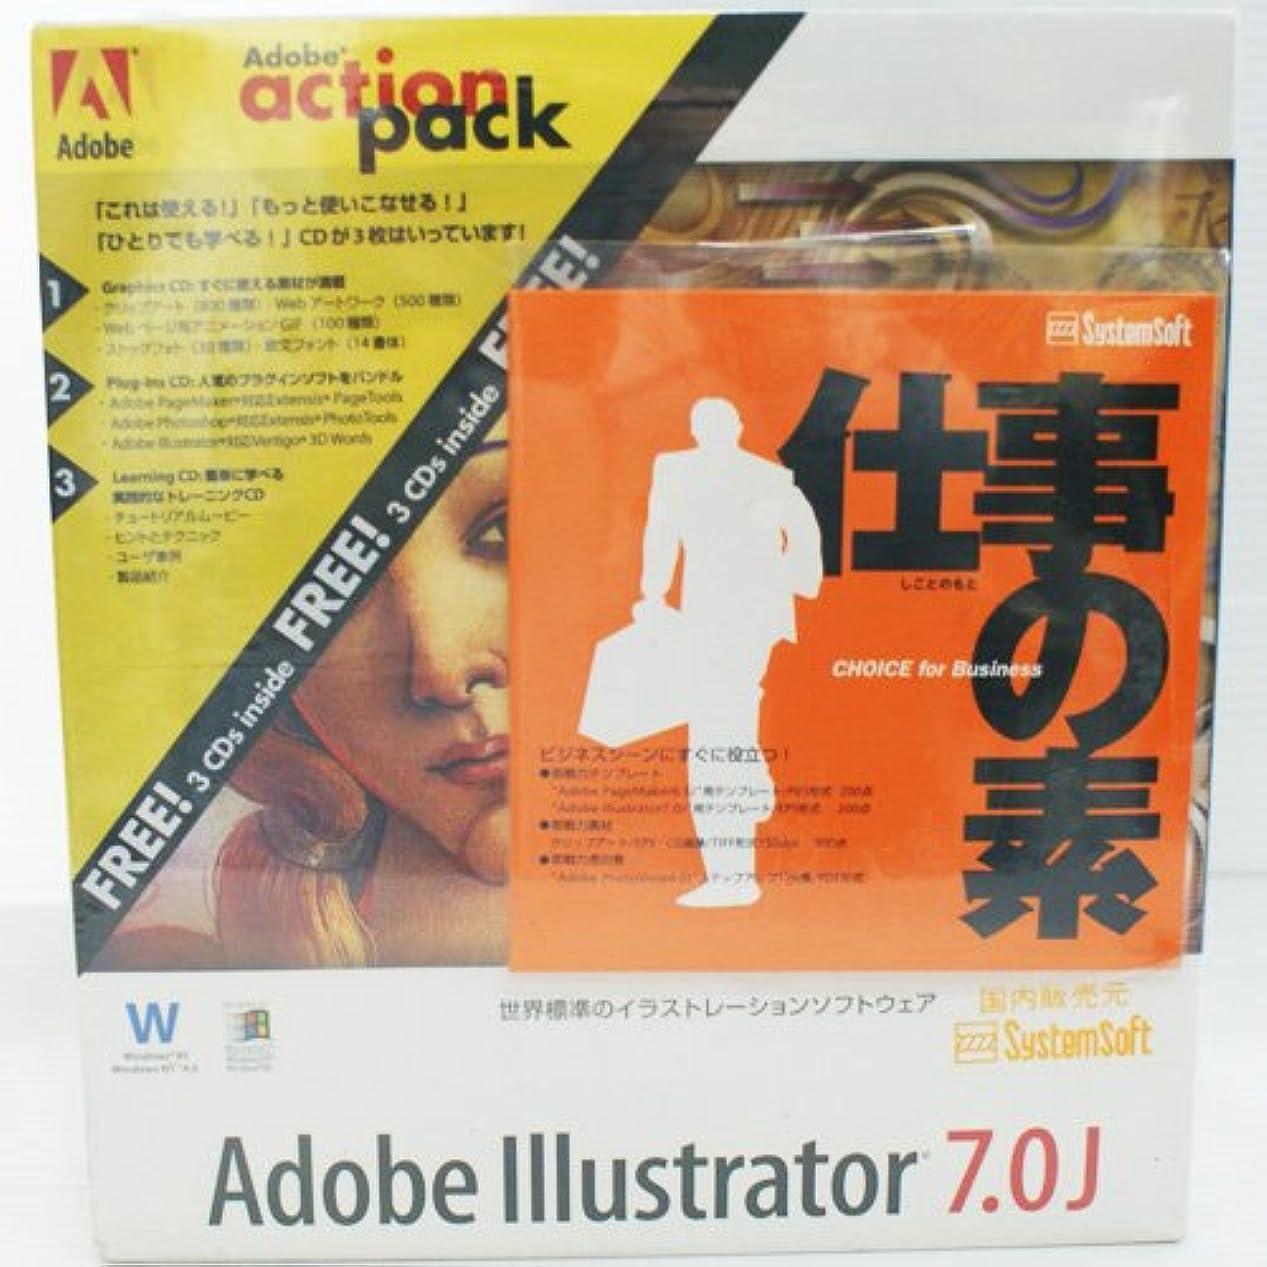 二十推測する確率Adobe Illustrator 7.0J 日本語版 Windows版